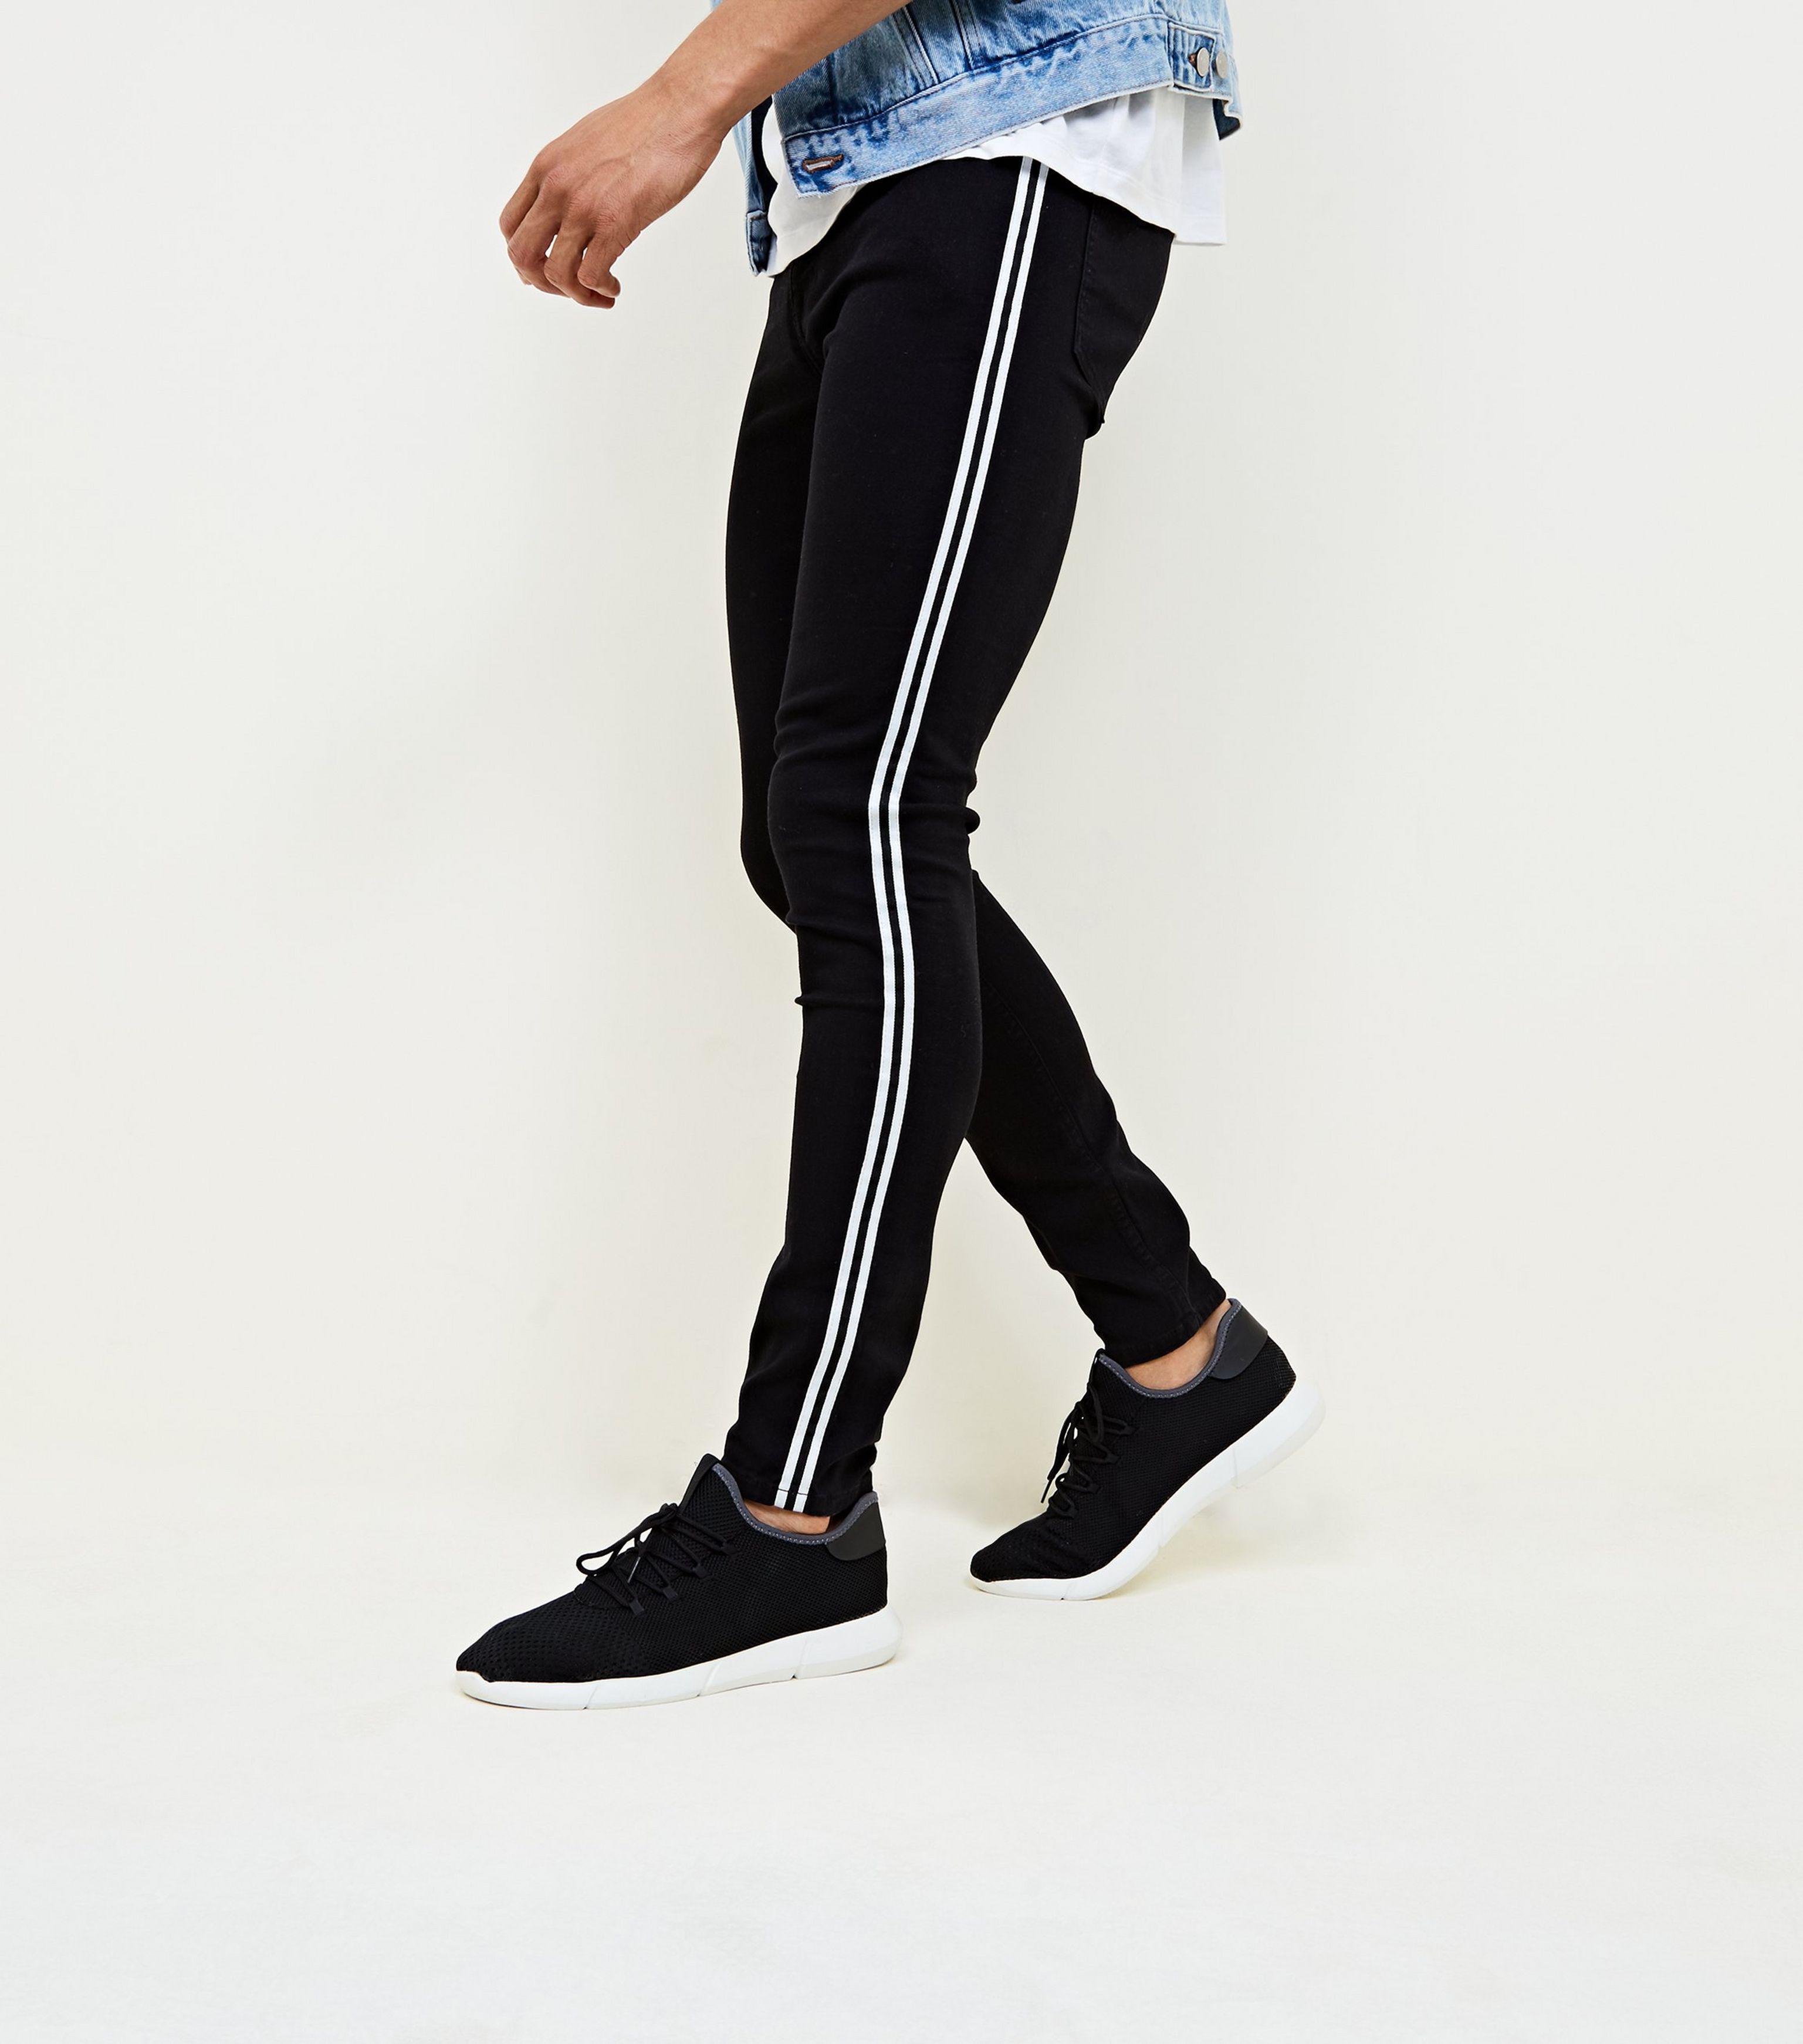 c0d62c00b15a New Look Black Side Stripe Skinny Jeans in Black for Men - Lyst